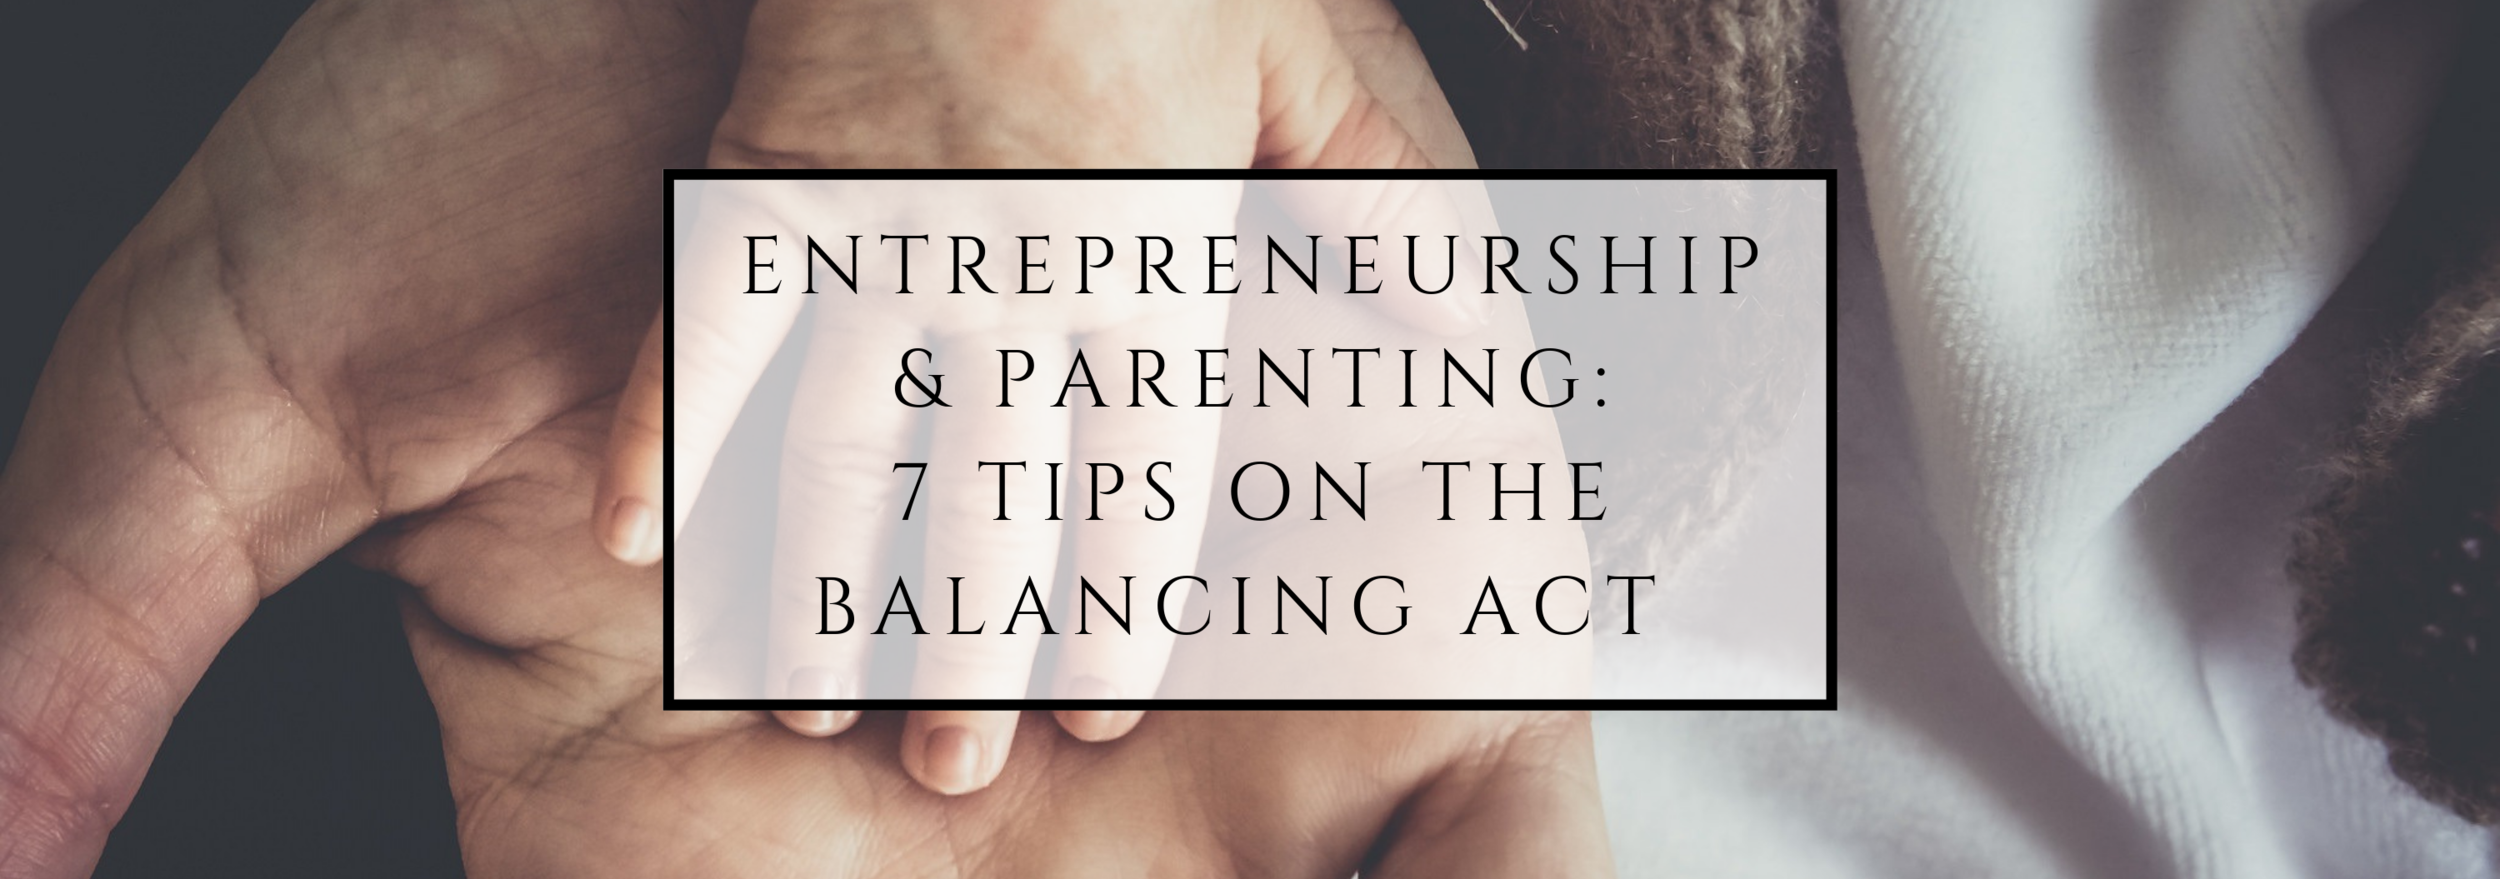 entrepreneurship & parenting blog.png